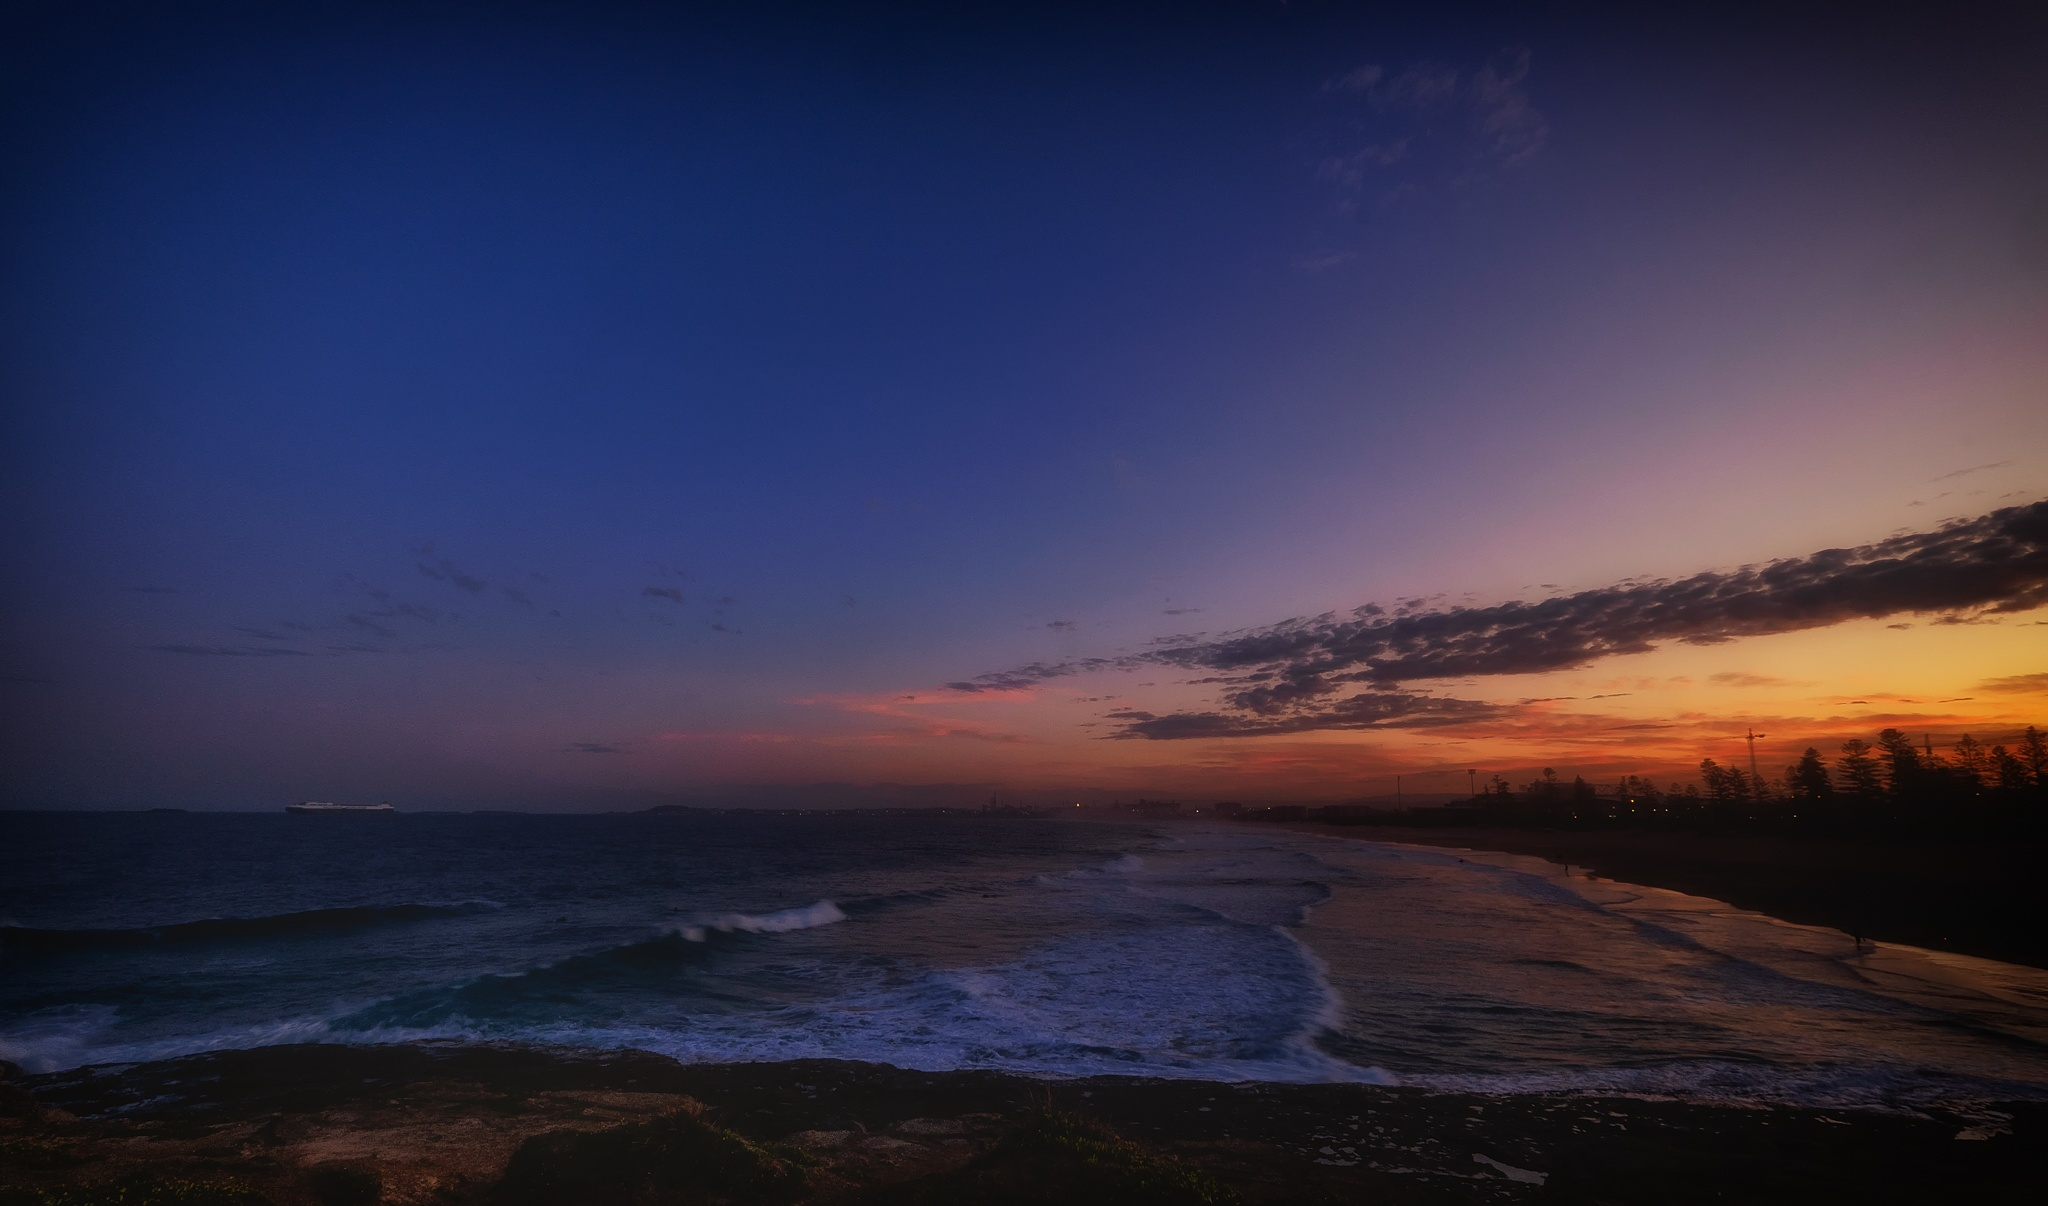 Wollongong Beach after Sunset by Peter Medbury